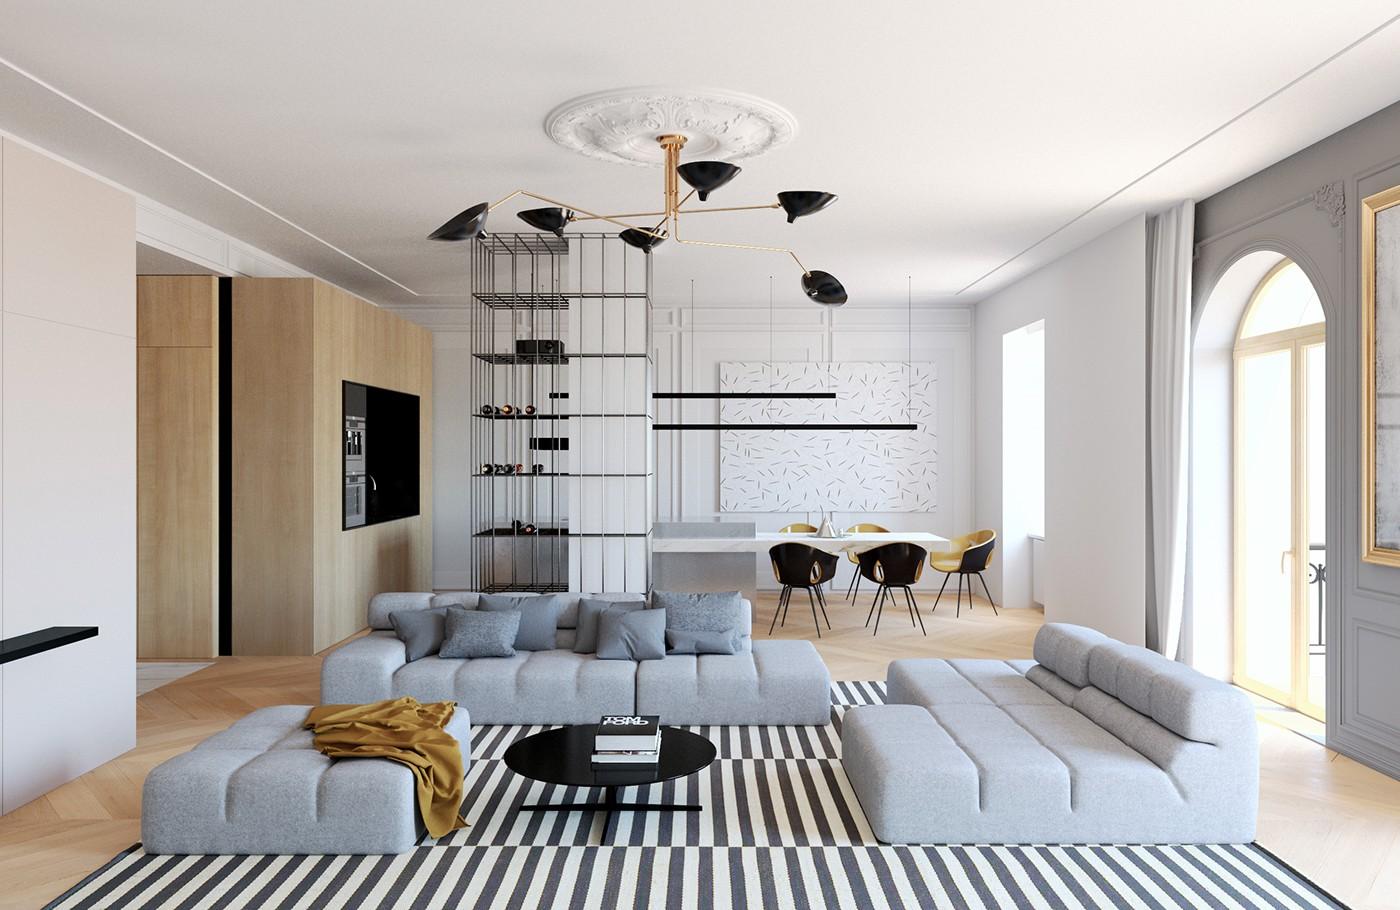 Interior Design Styles: What\'s your interior design flavour? – DecorNg